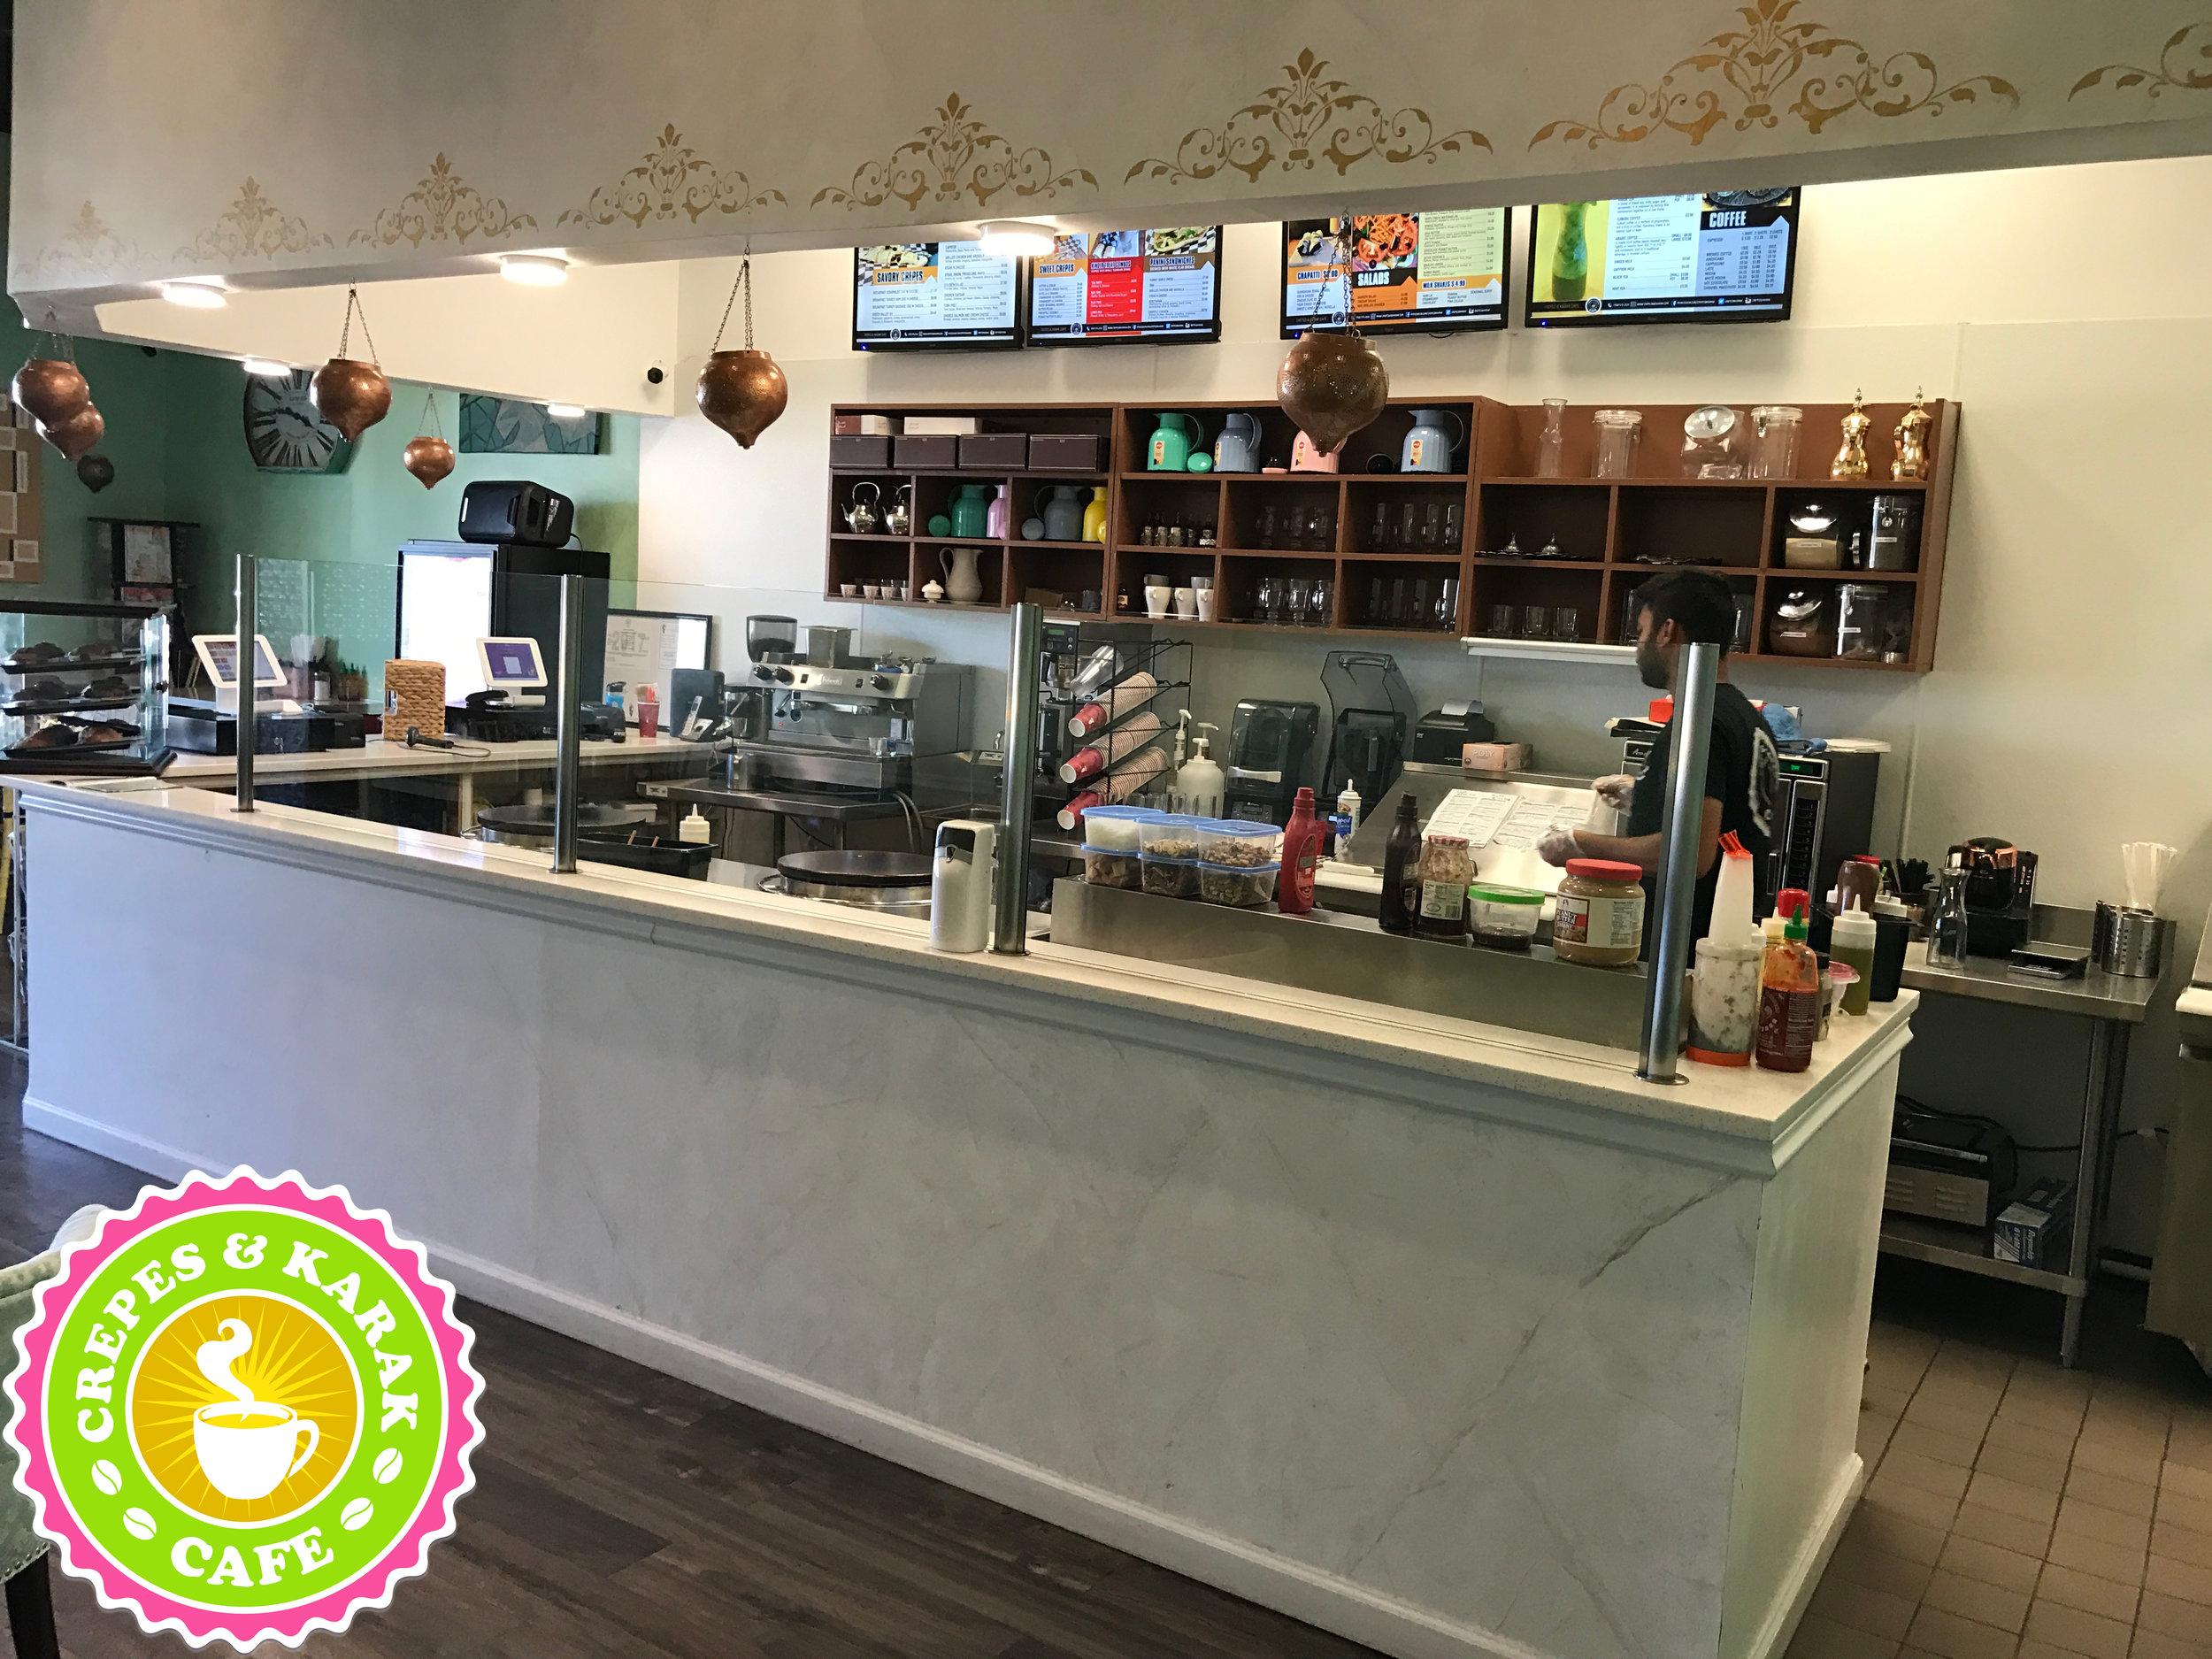 cafe-near-me.jpg